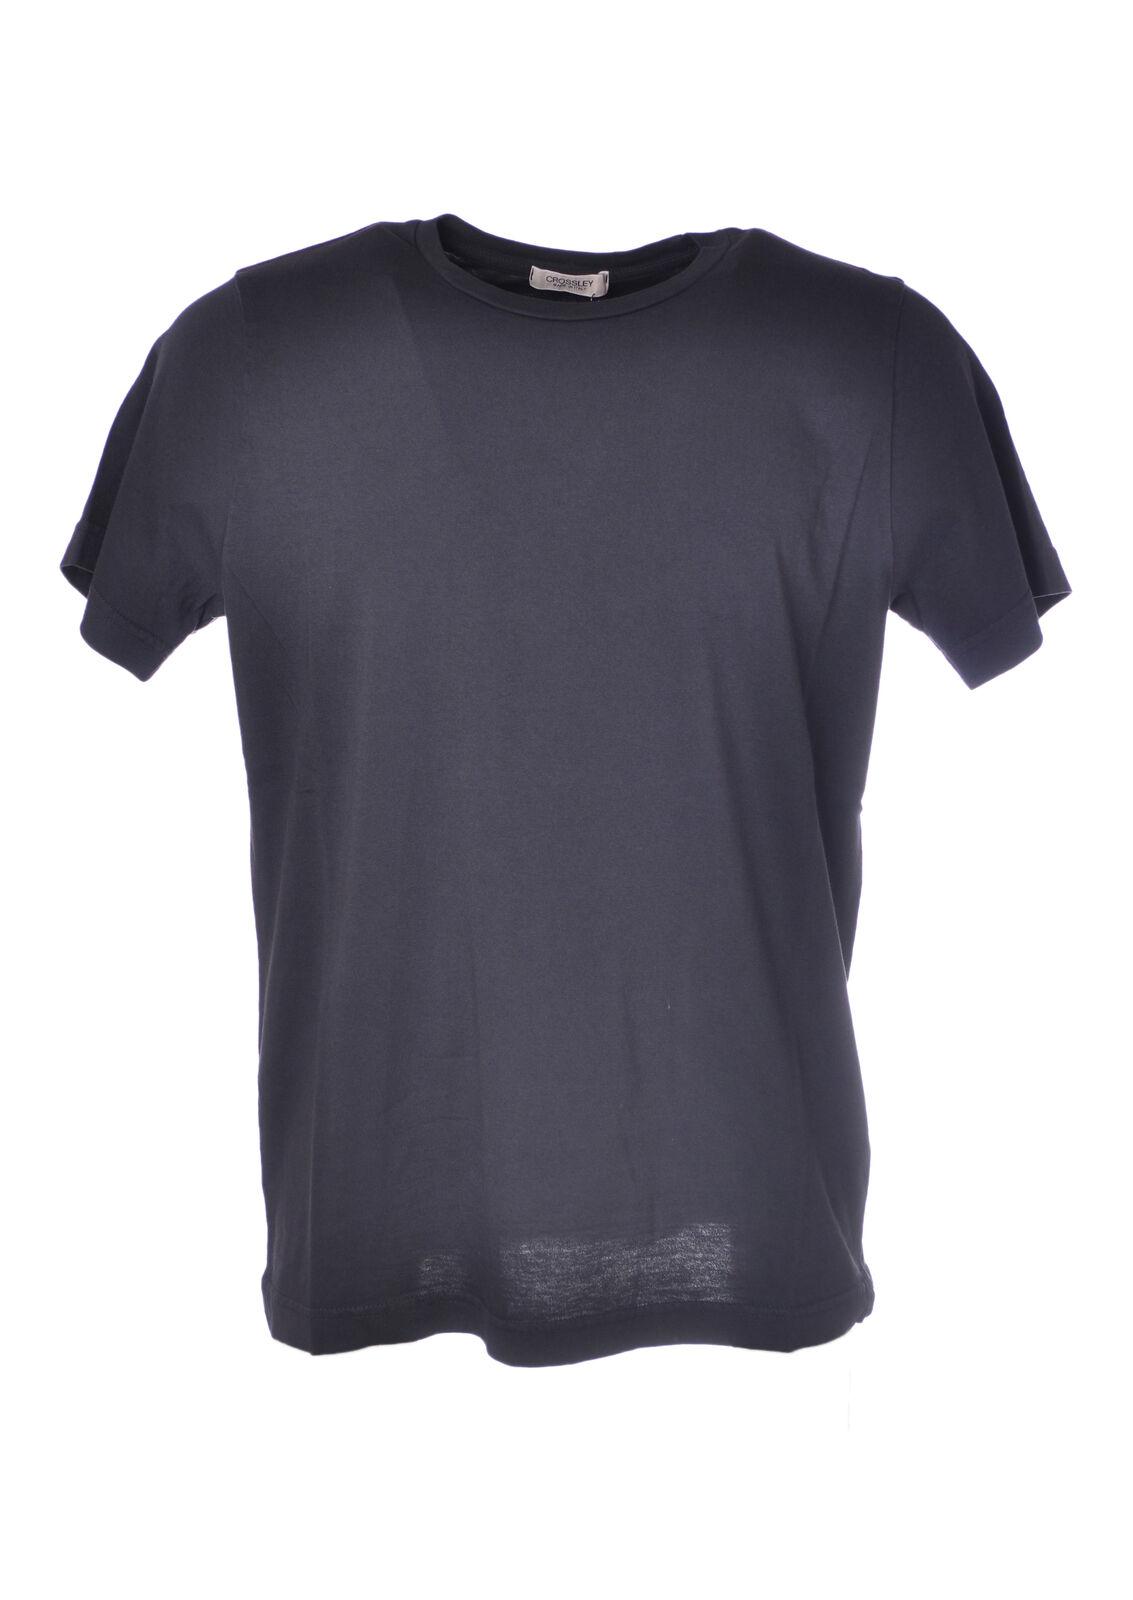 CROSSLEY - Topwear-T-shirts - Man - bluee - 5057005G184319